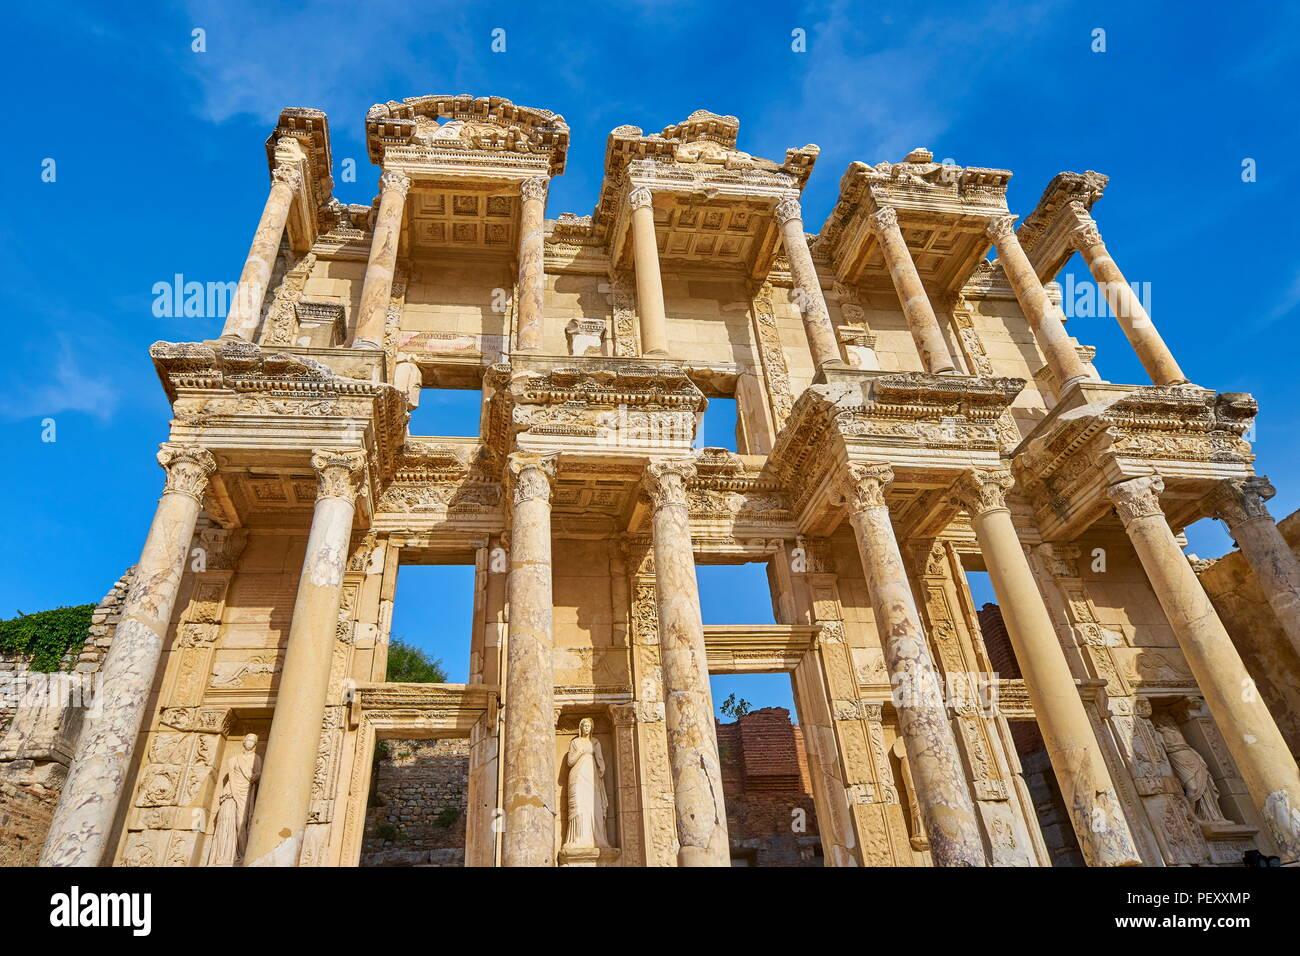 Efes, Bibliothek des Kelsos in Ephesus antike Stadt, Izmir, Türkei Stockbild